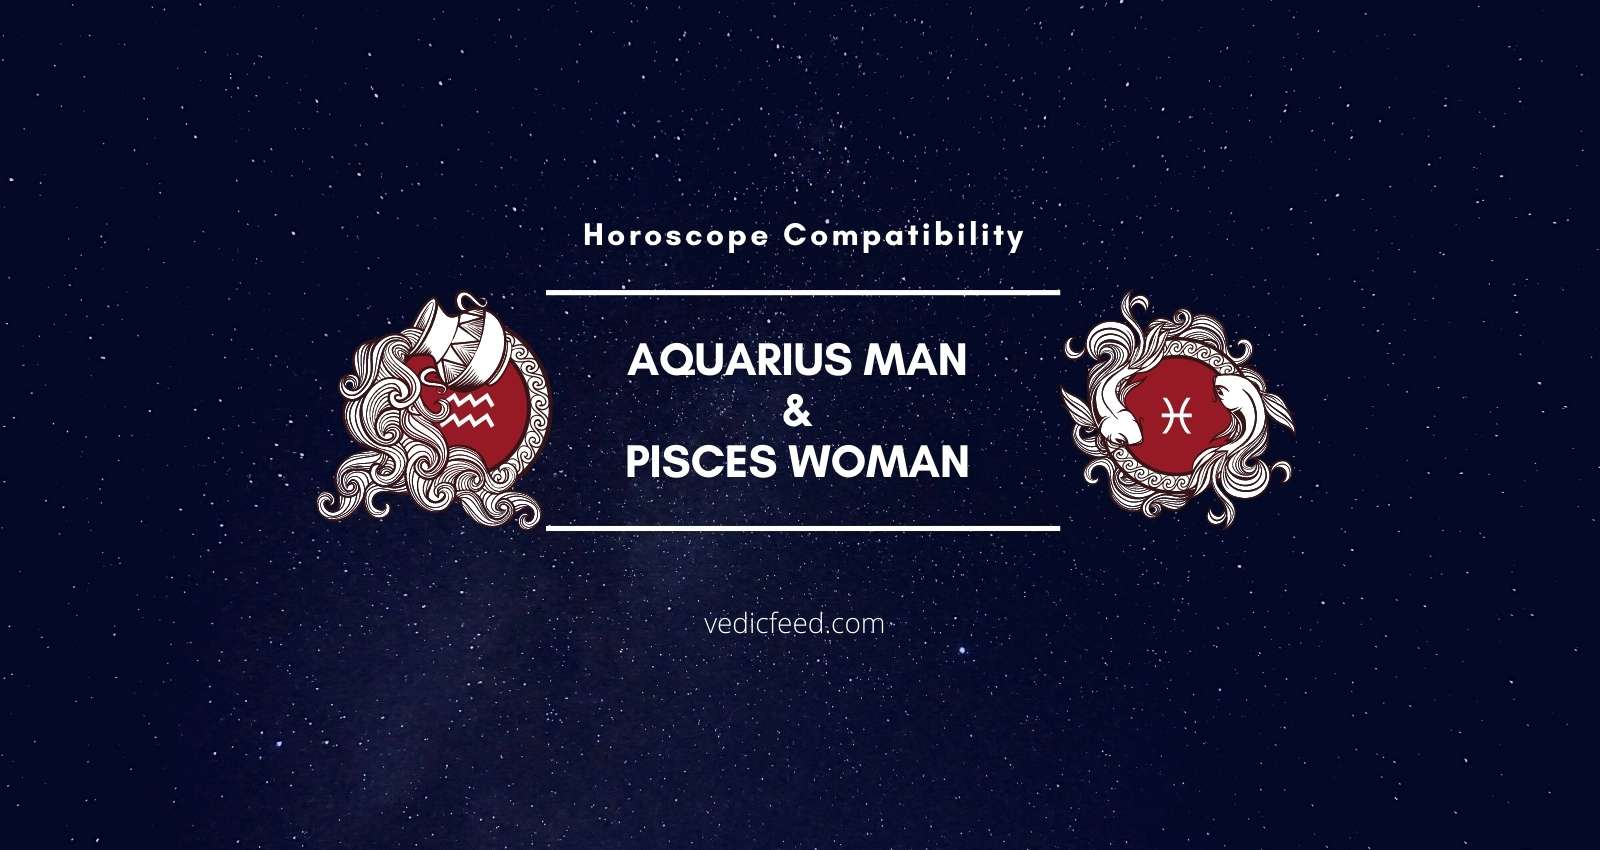 Aquarius Man and Pisces Woman Compatibility